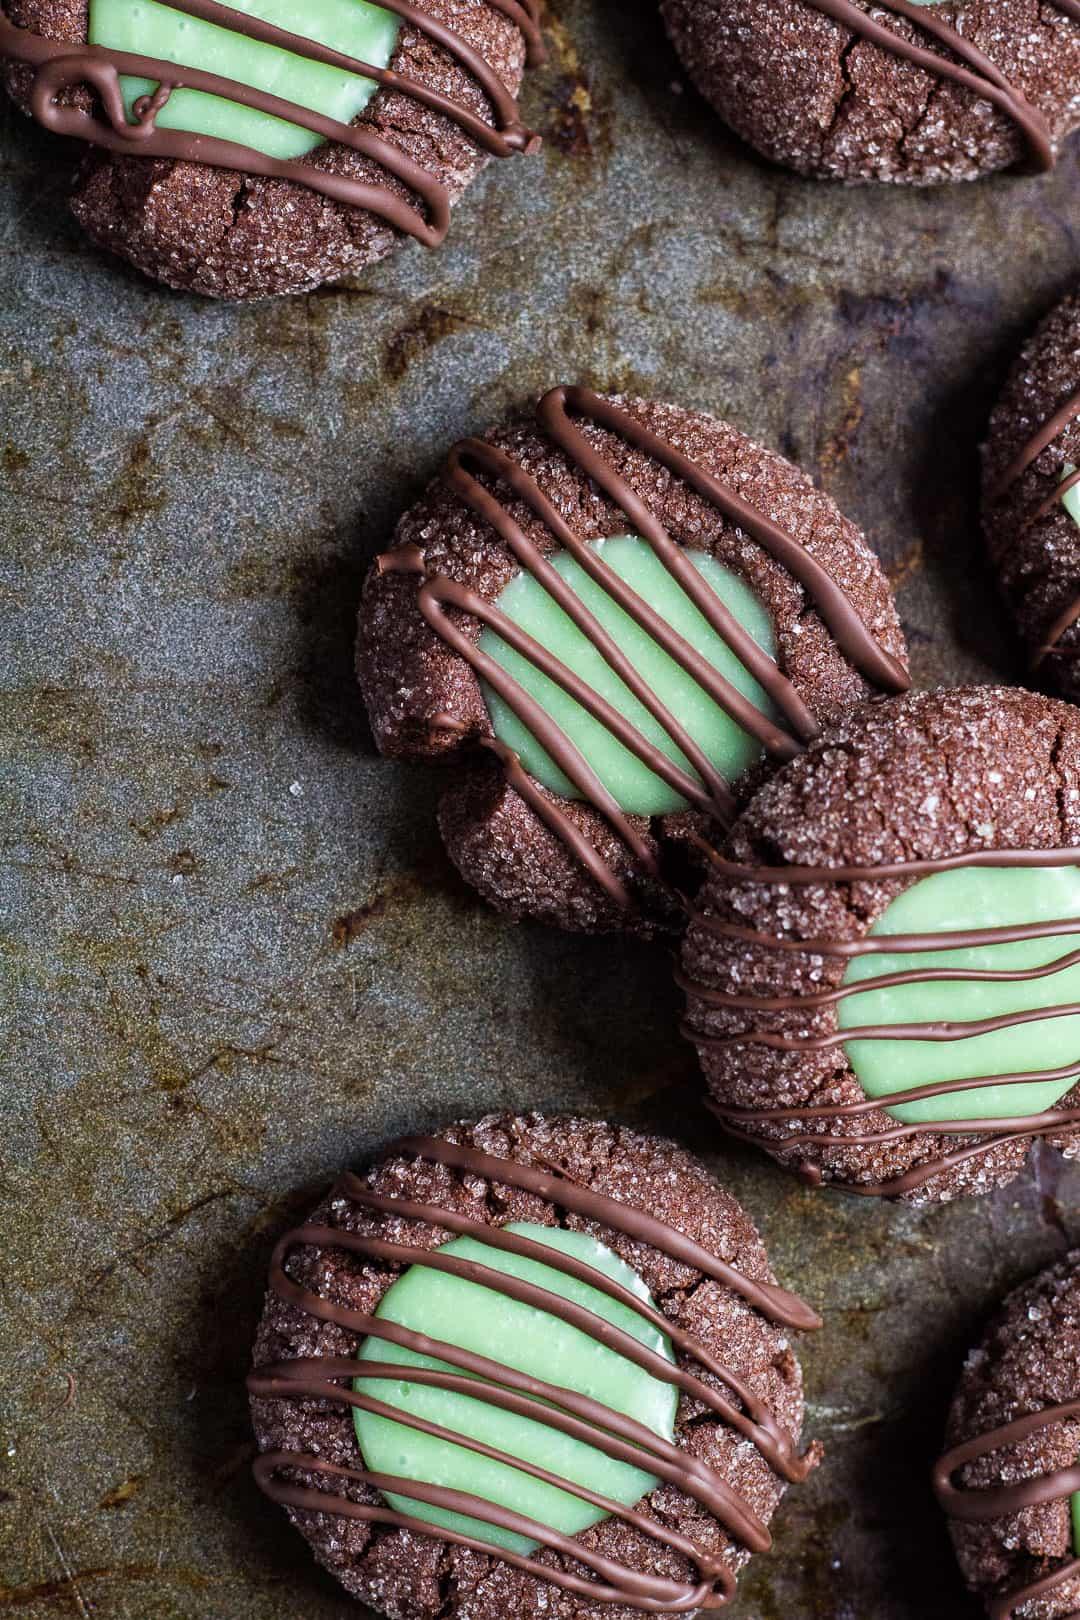 Holiday thumbprint cookies: Mint Chocolate Thumbprint Cookies| Marsha's Baking Addiction